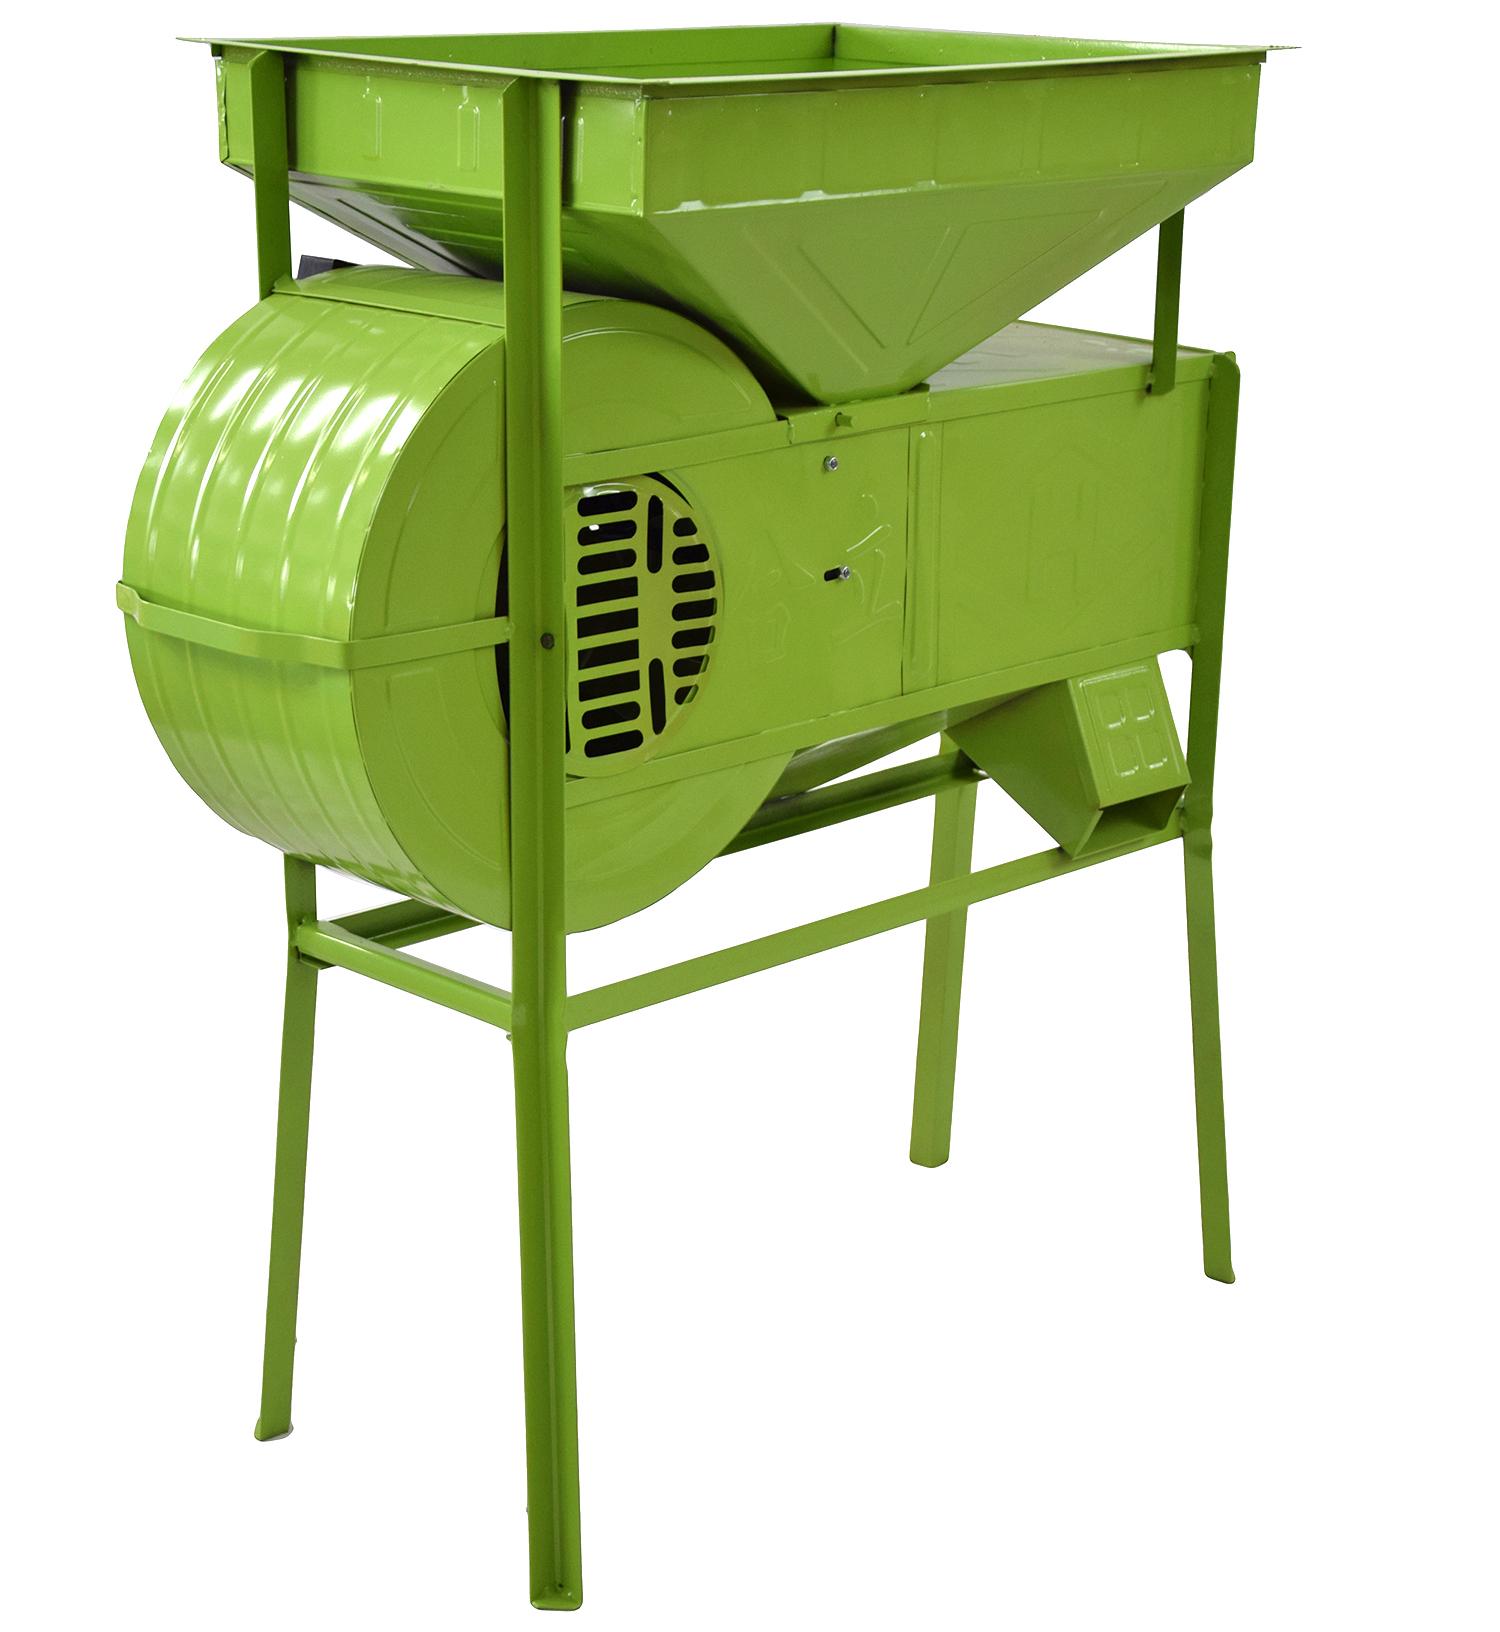 Heli зерна winnower машина зерна winnower цена какао зерна winnower